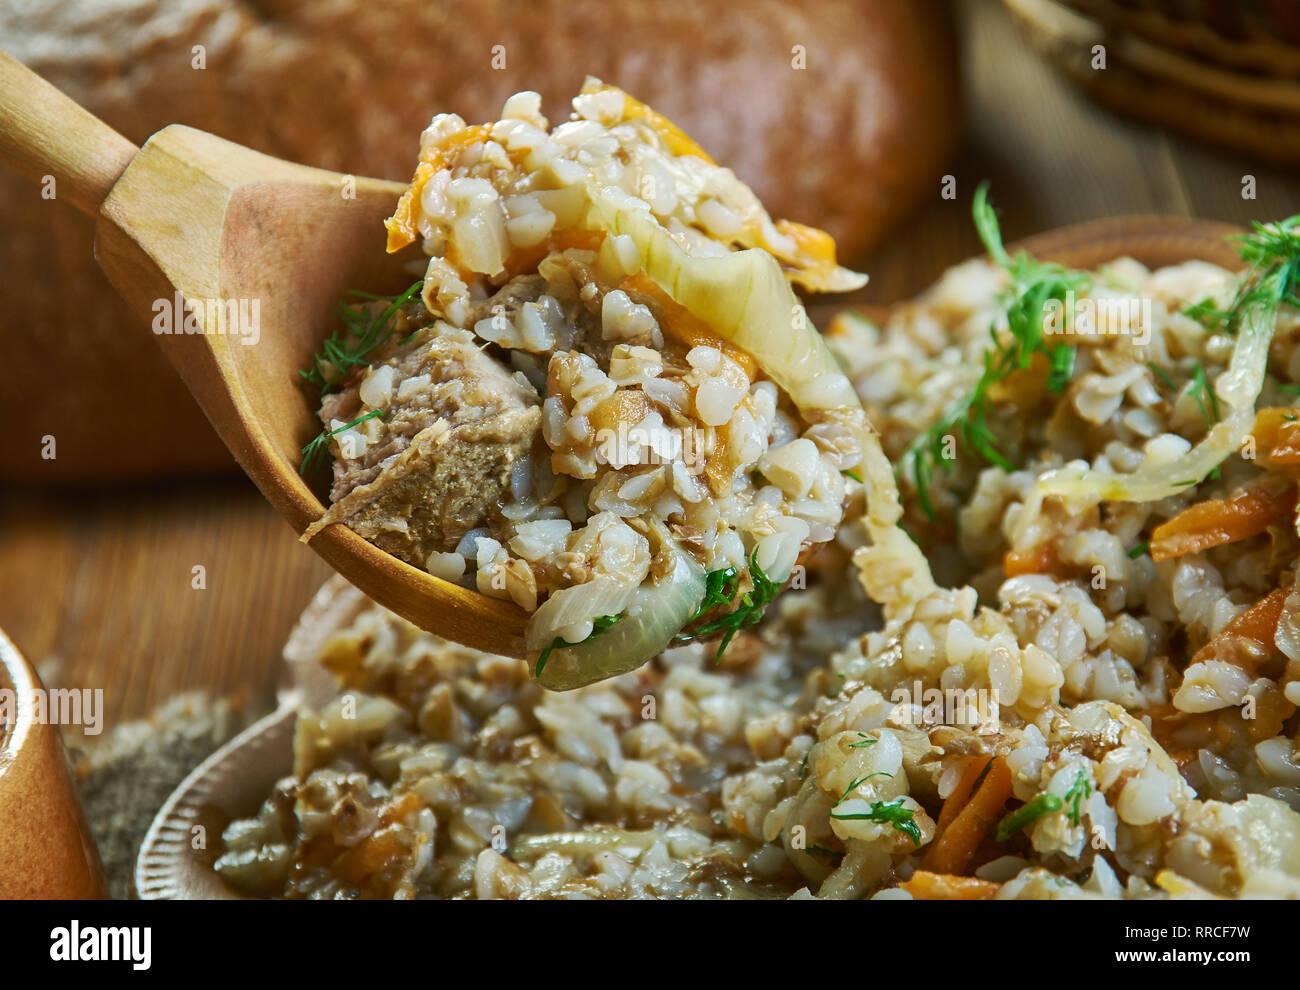 Kasha Po Kupecheski Buckwheat Porridge Vegetables Und Beef Russian 19th Century Classic Cuisine Assorted Dishes Top View Stock Photo Alamy